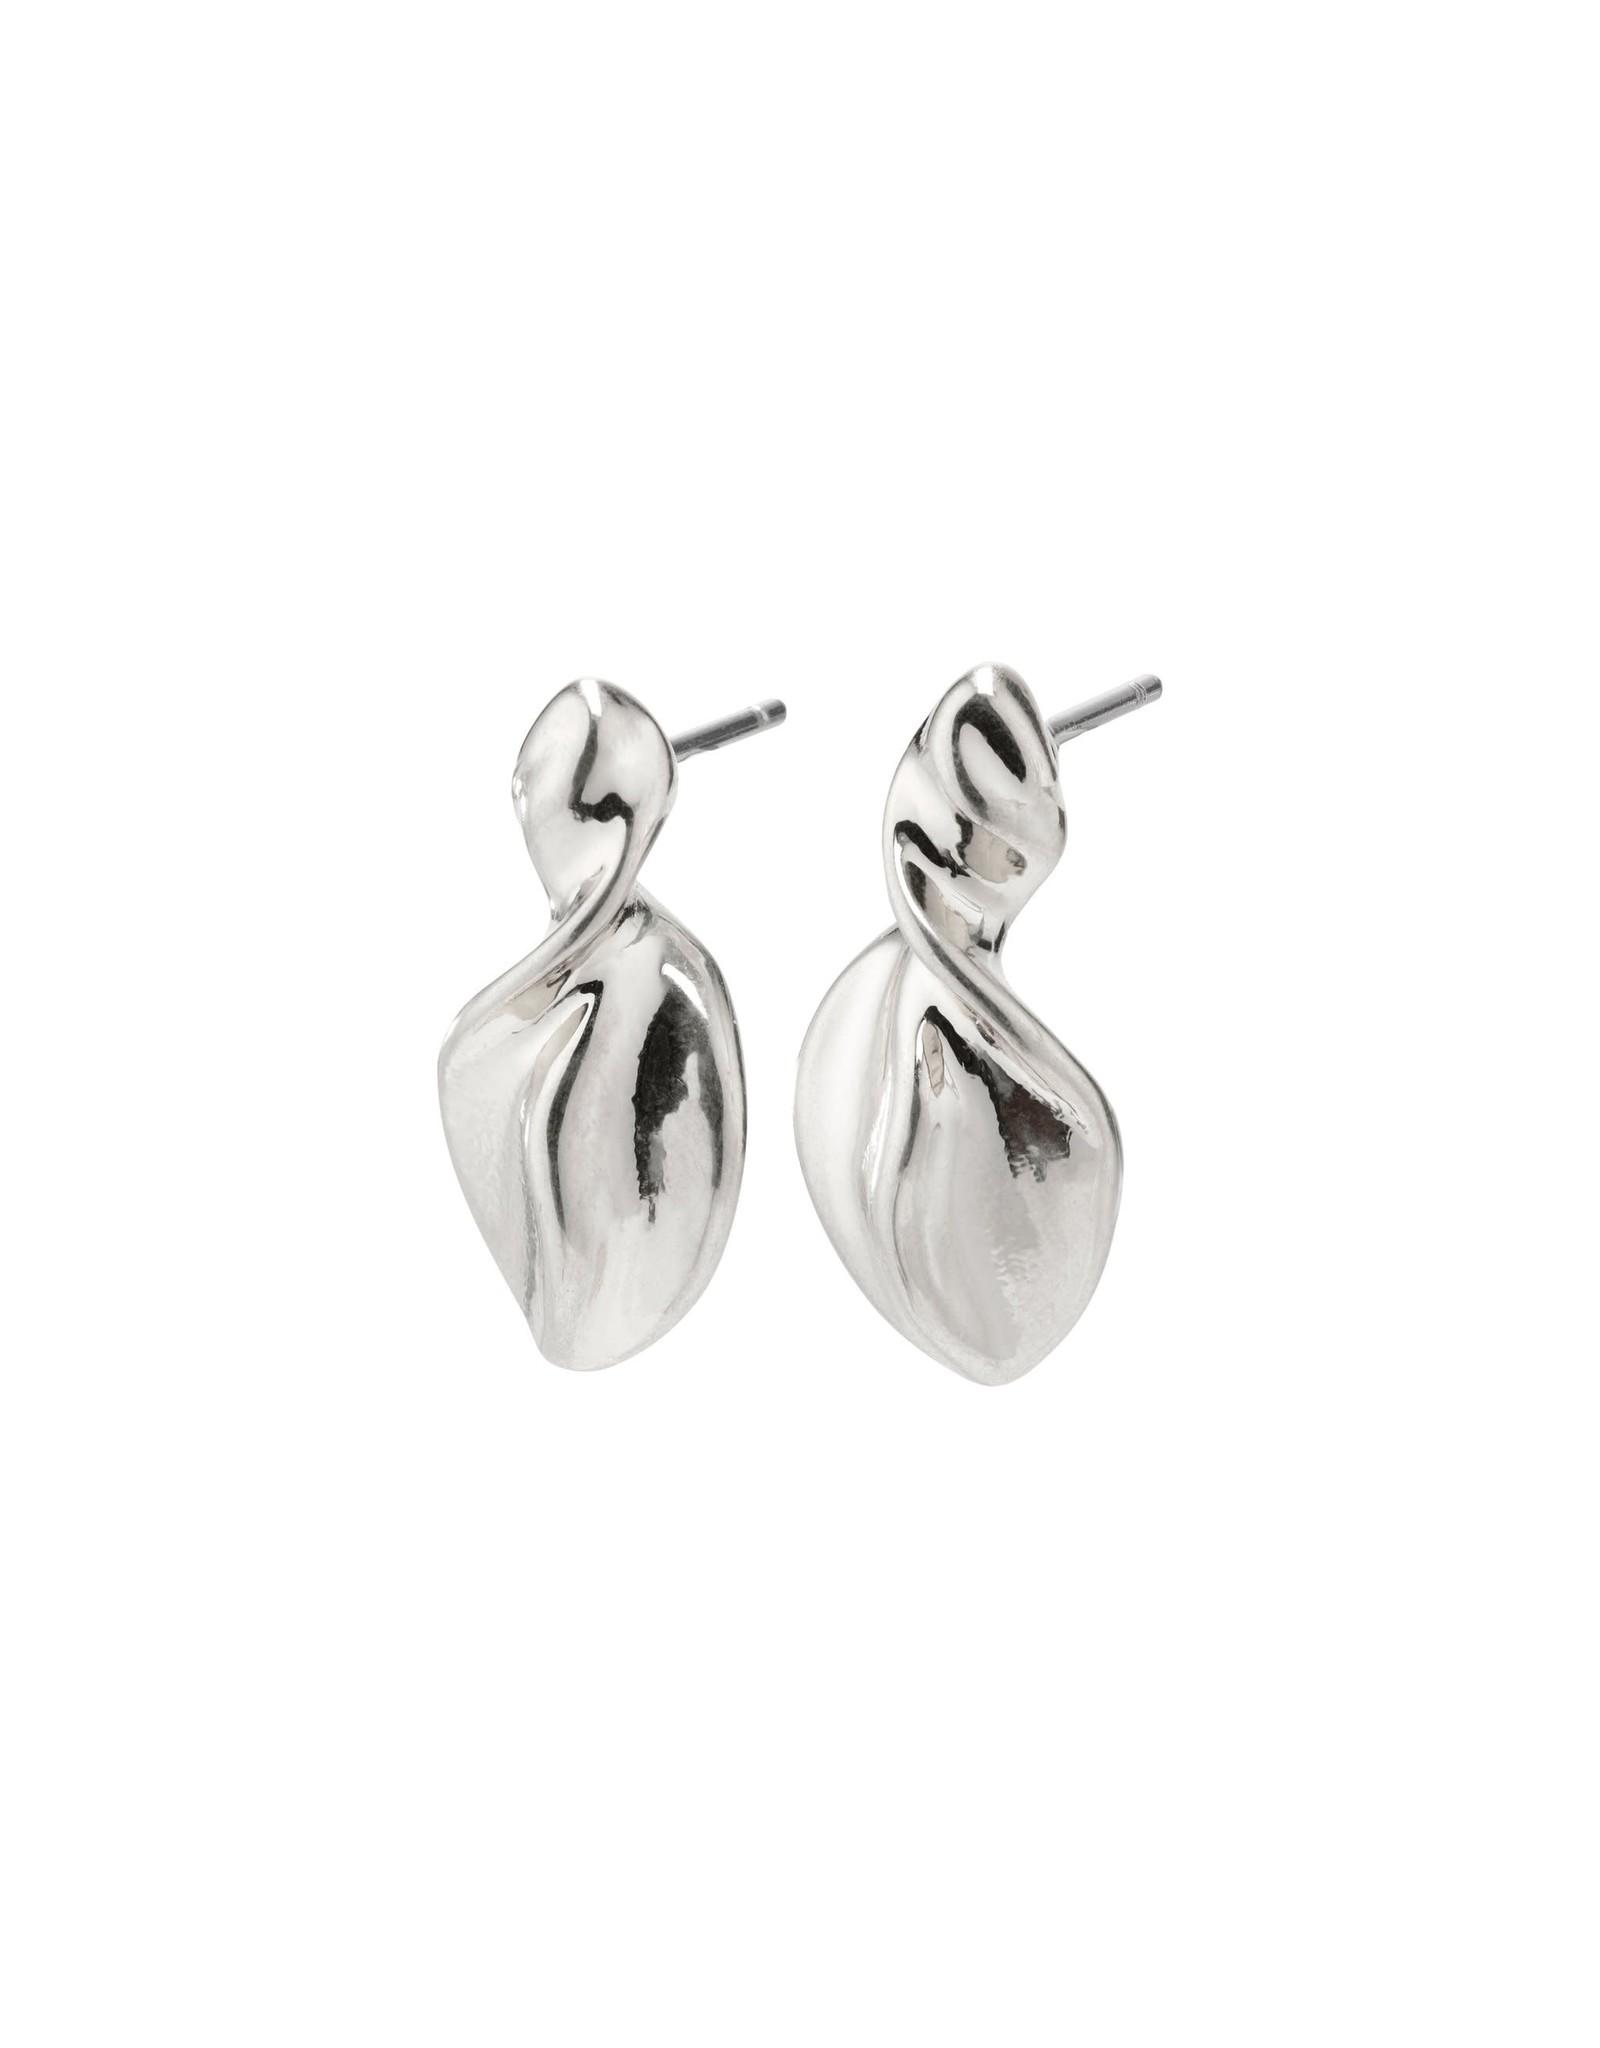 Pilgrim Pilgrim Hollis Earrings Silver Plated